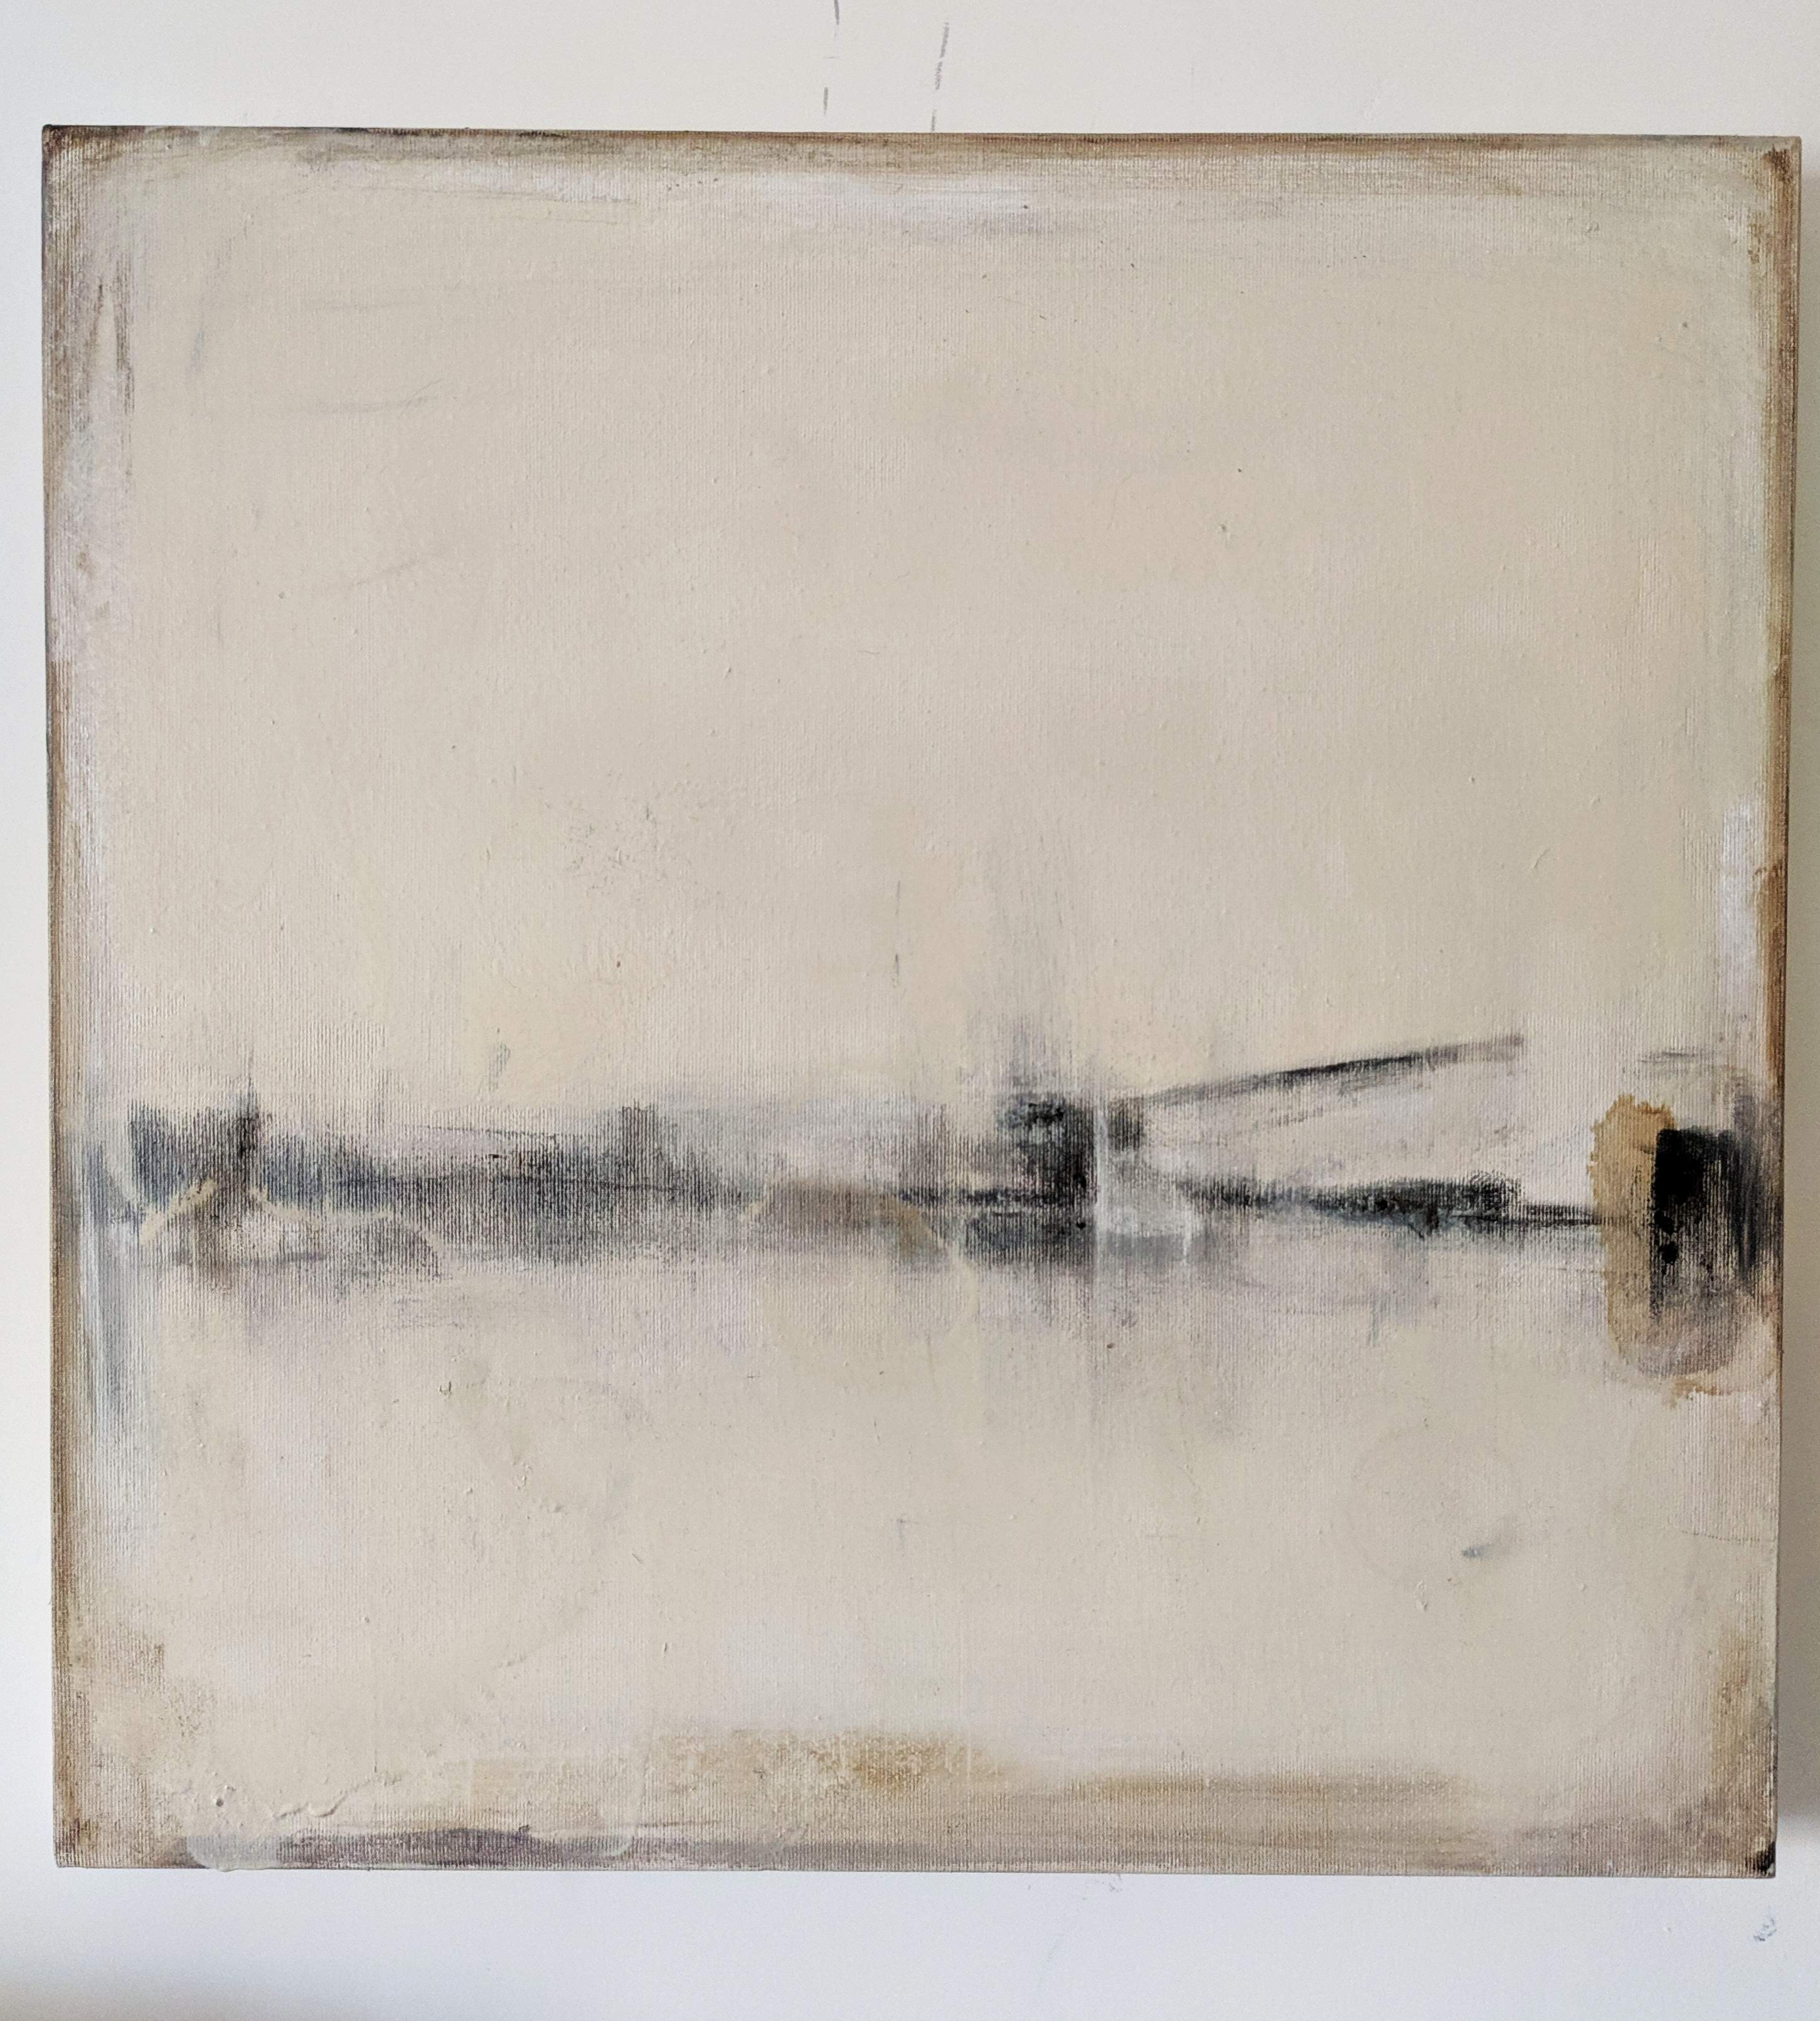 Landscape 56, Contemporary Abstract Art Mixed Media Minimalist Monochrome White